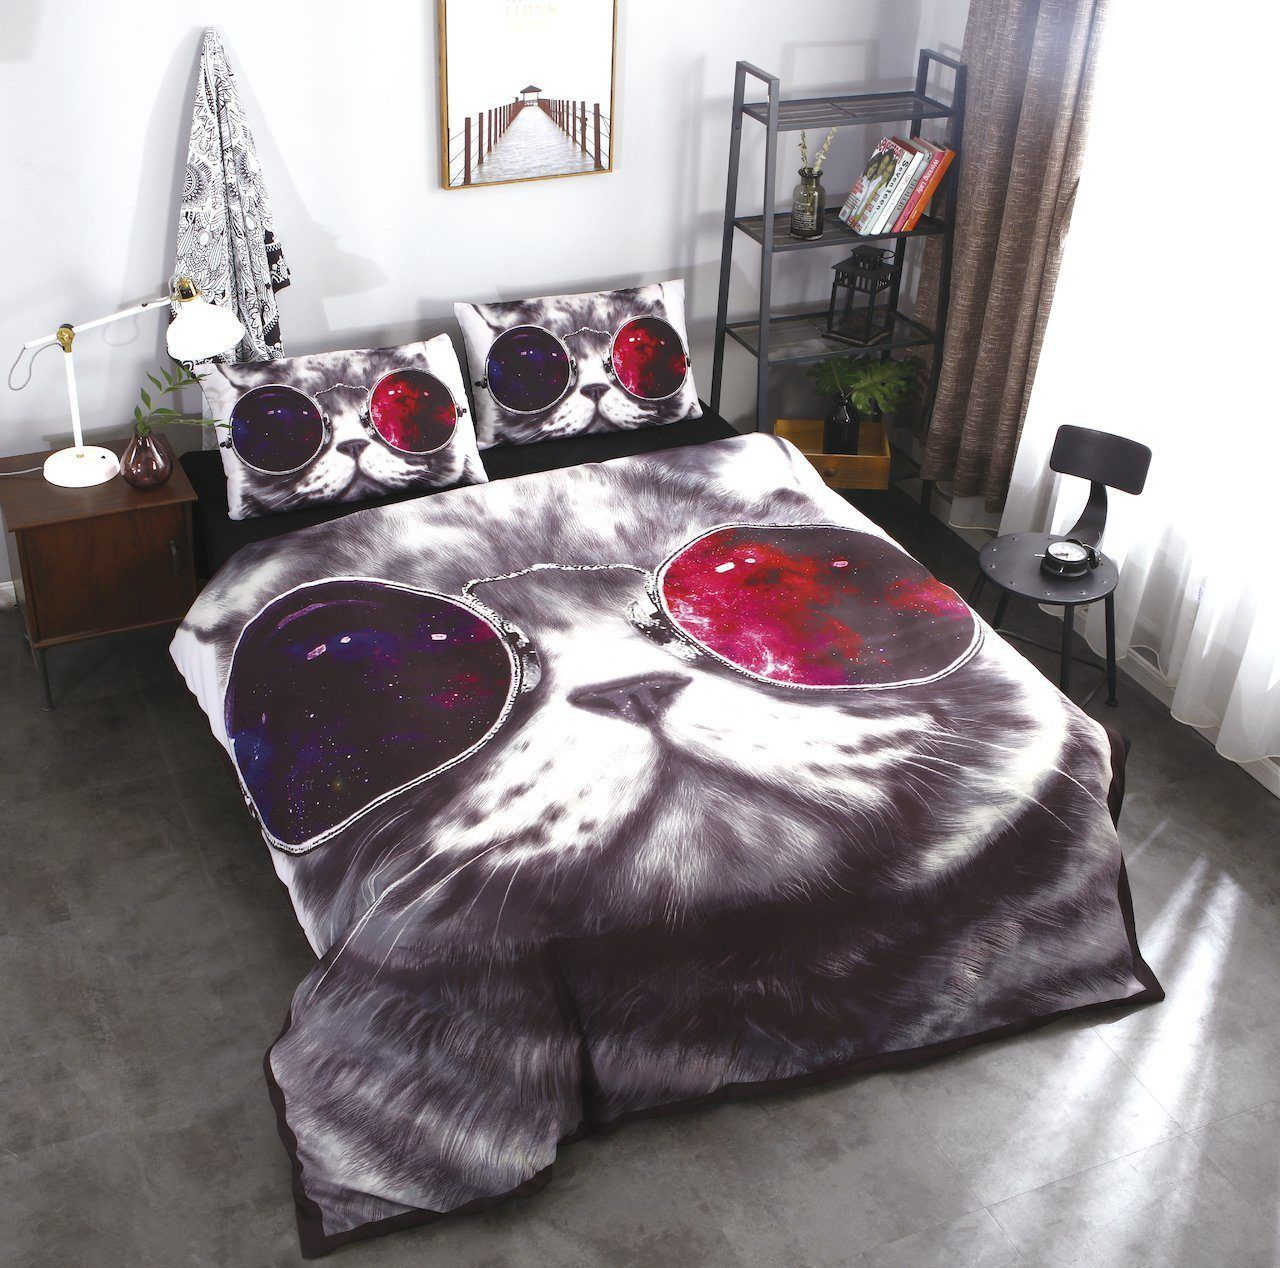 Sitrade / Cool bedding CFA002, 2 sleeping pillowcases 50-70 2 pcs.